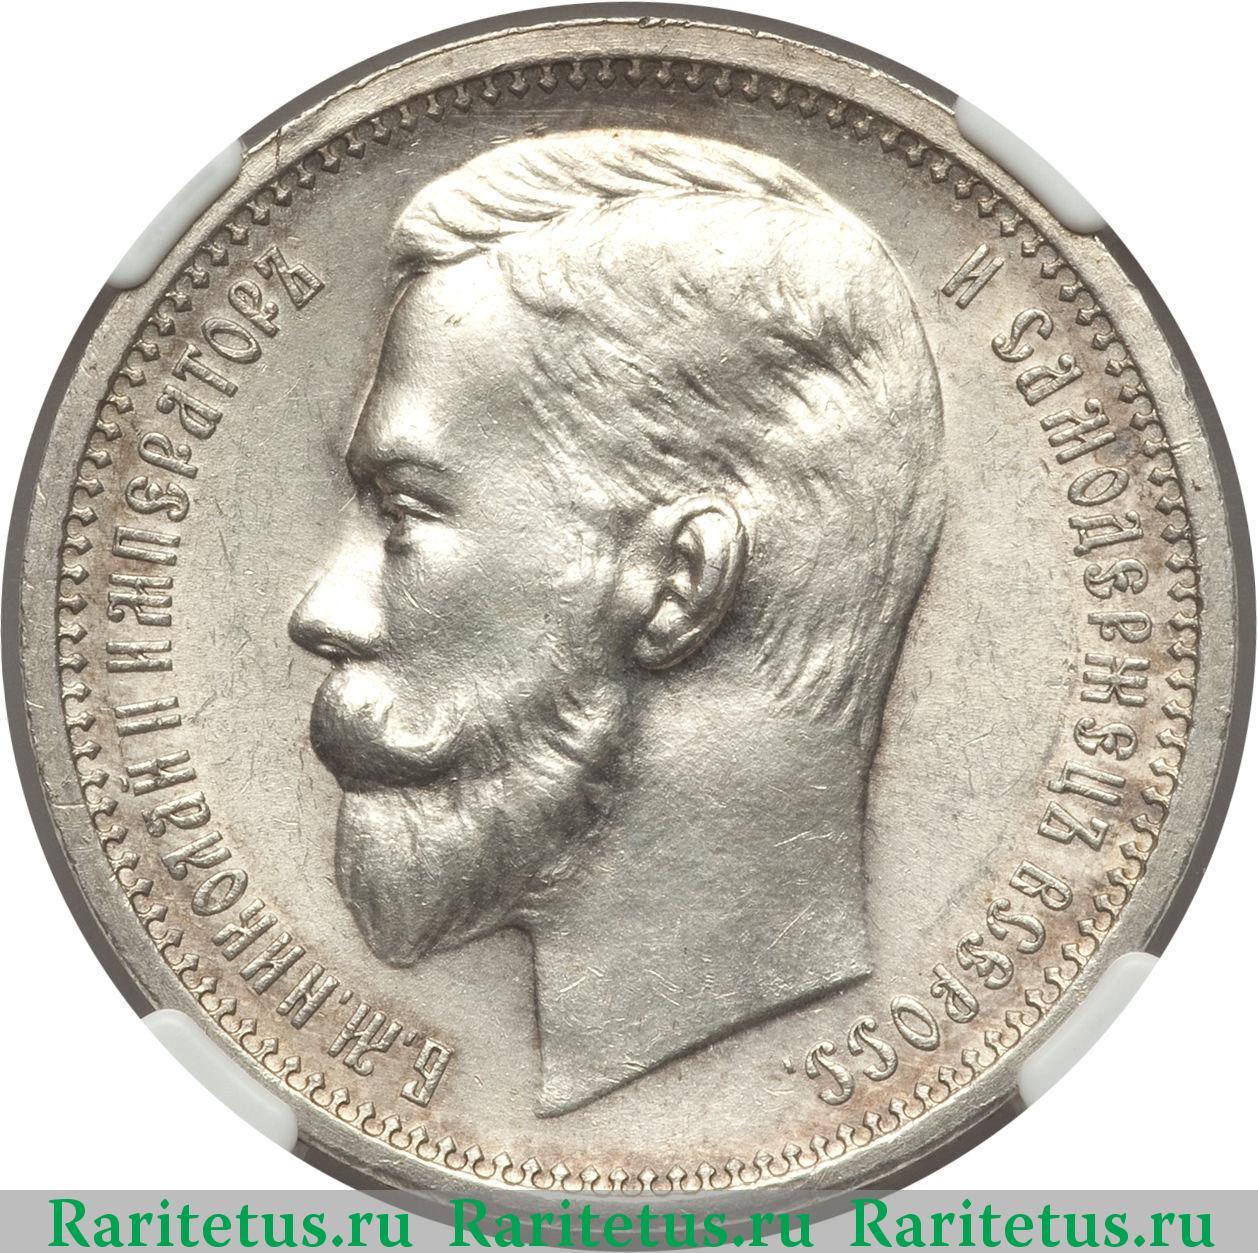 Монета рубль 1913 года цена монеты рубли олимпиада 80